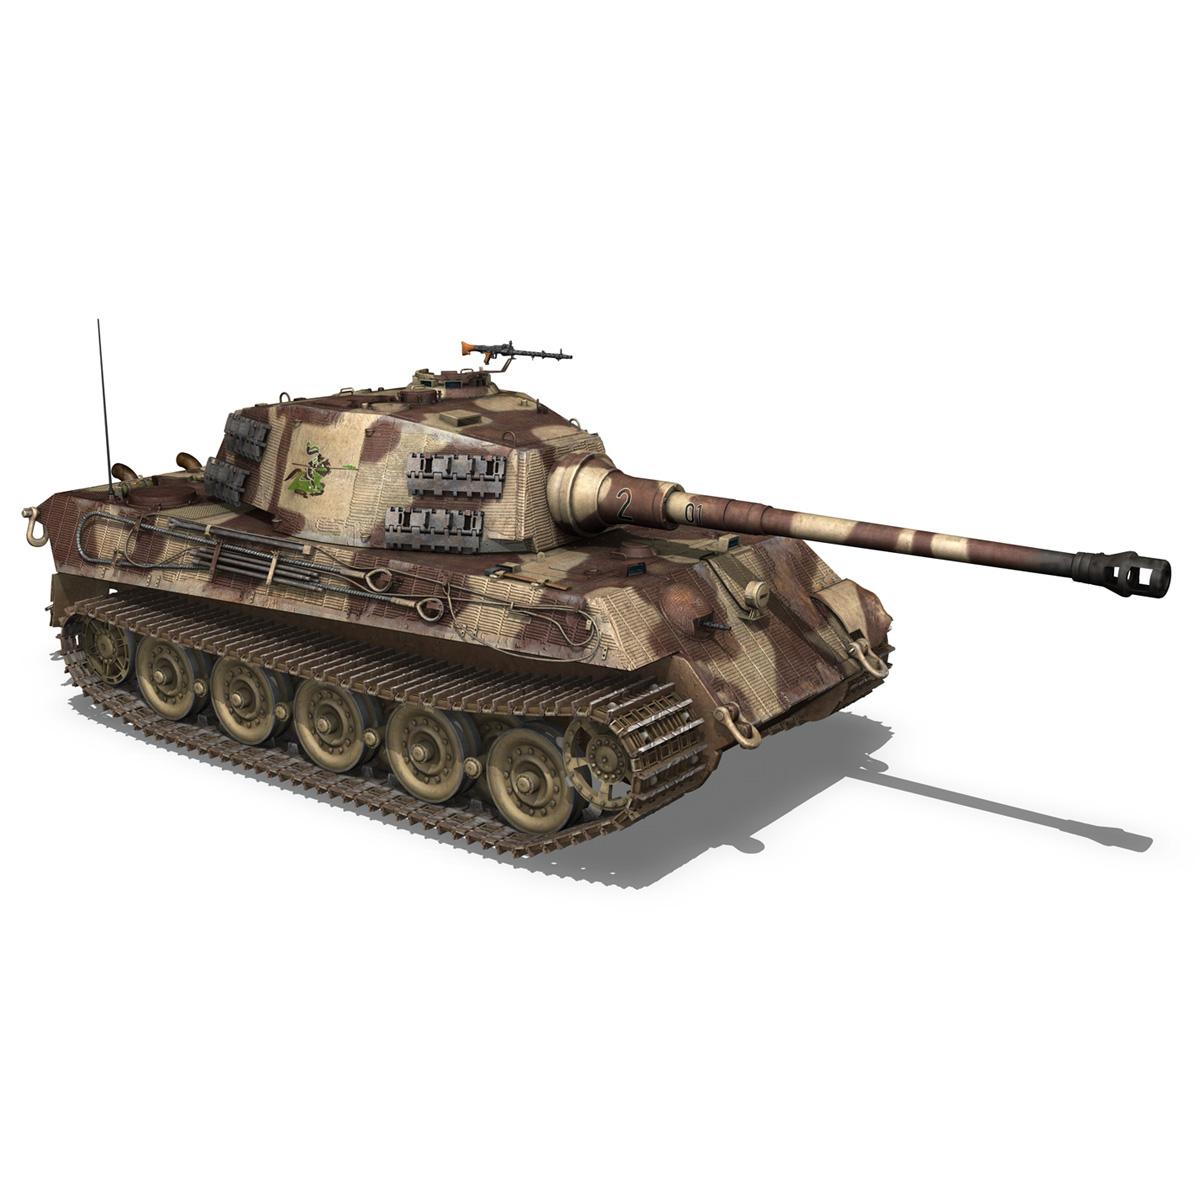 panzerkampfwagen vi – ausf b – tiger ii – 201 3d model 3ds c4d lwo lw lws obj 293308